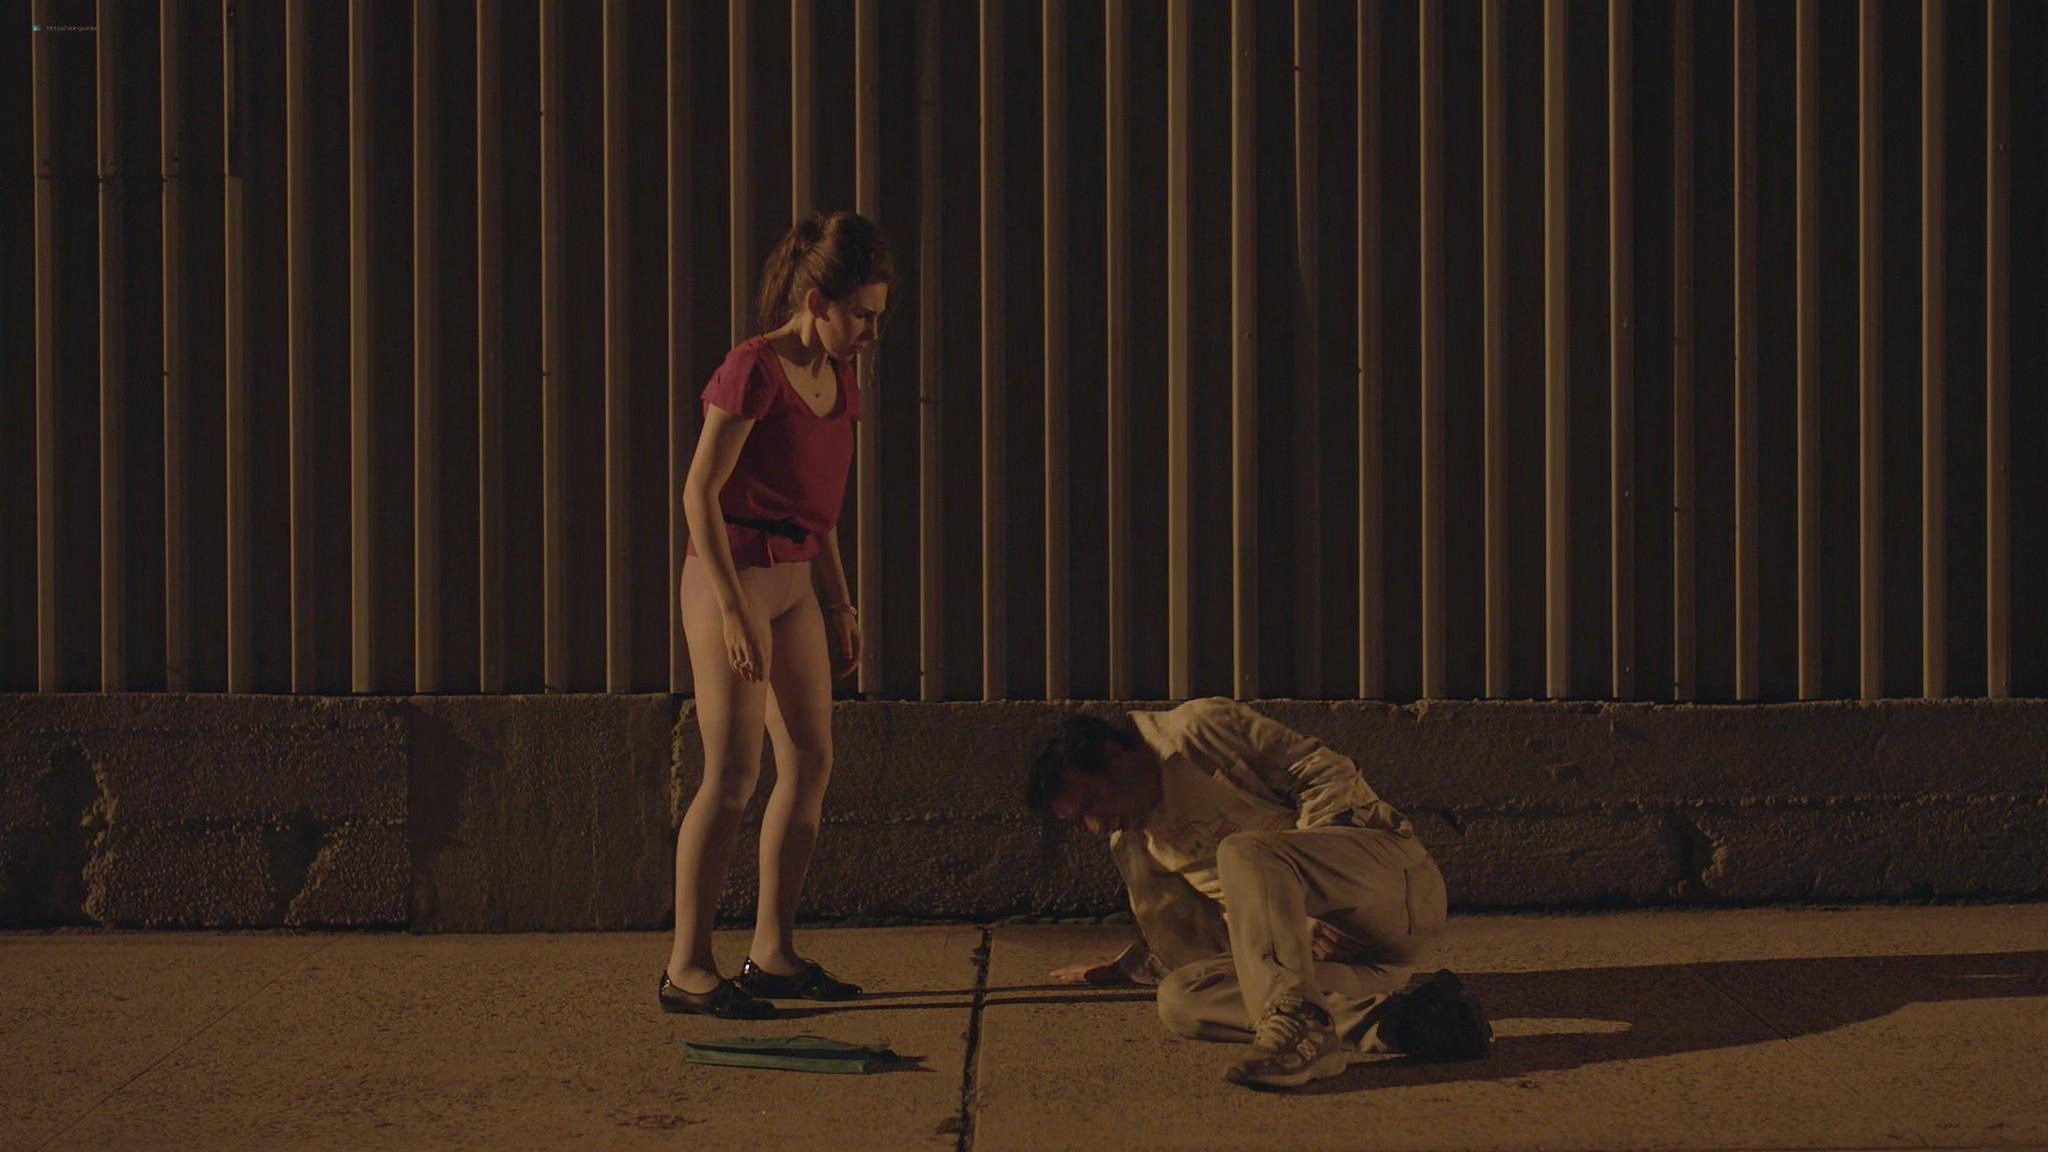 Allison Williams hot Lena Dunham nude Zosia Mamet Jemima Kirke nude and sexy Girls 2012 s1e6 10 1080p Web 5